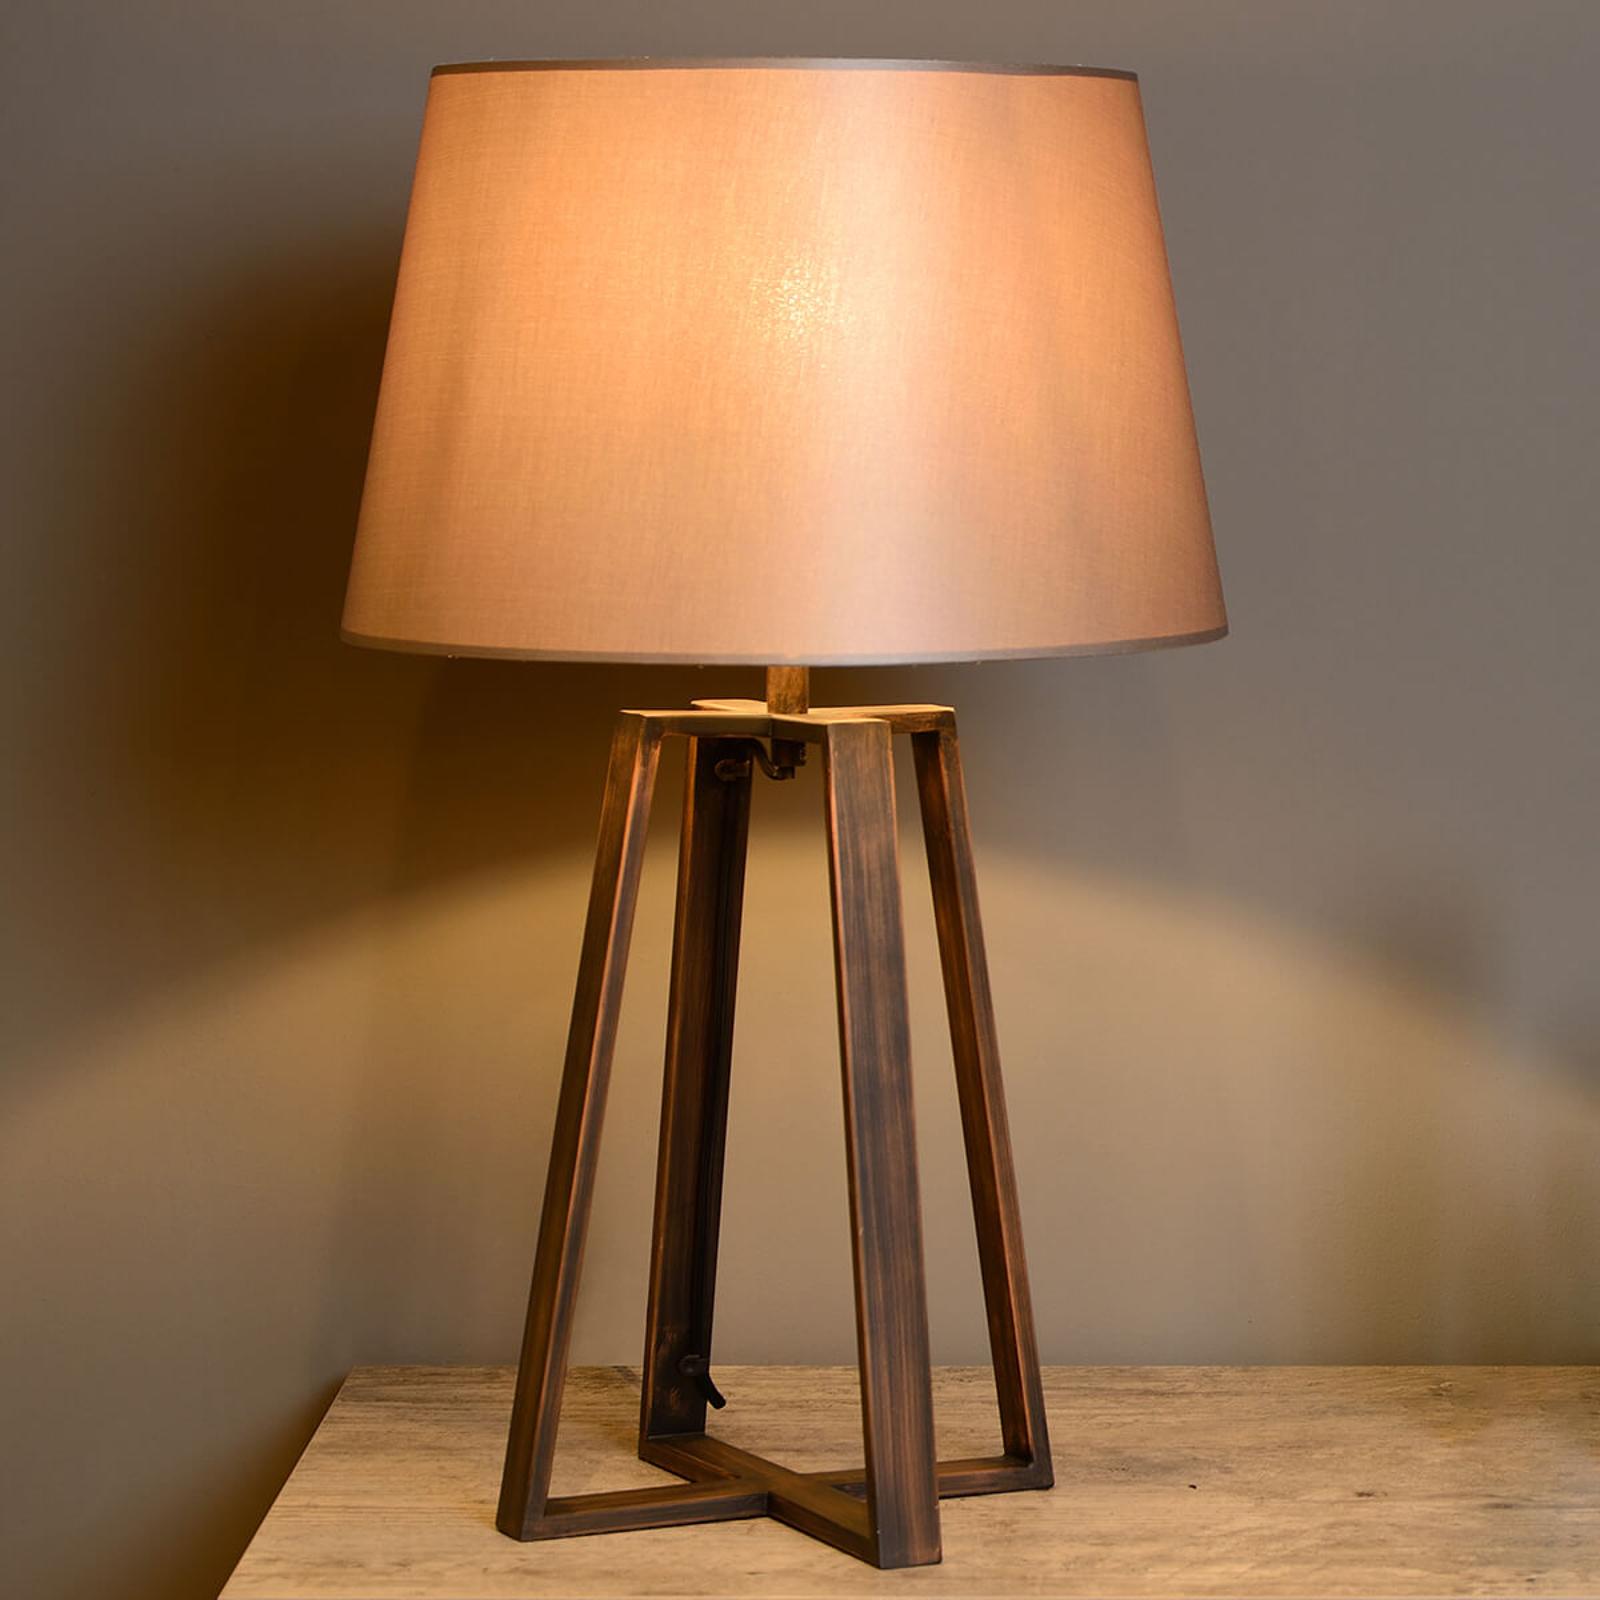 Lampe à poser Coffee Lamp, abat-jour en tissu brun